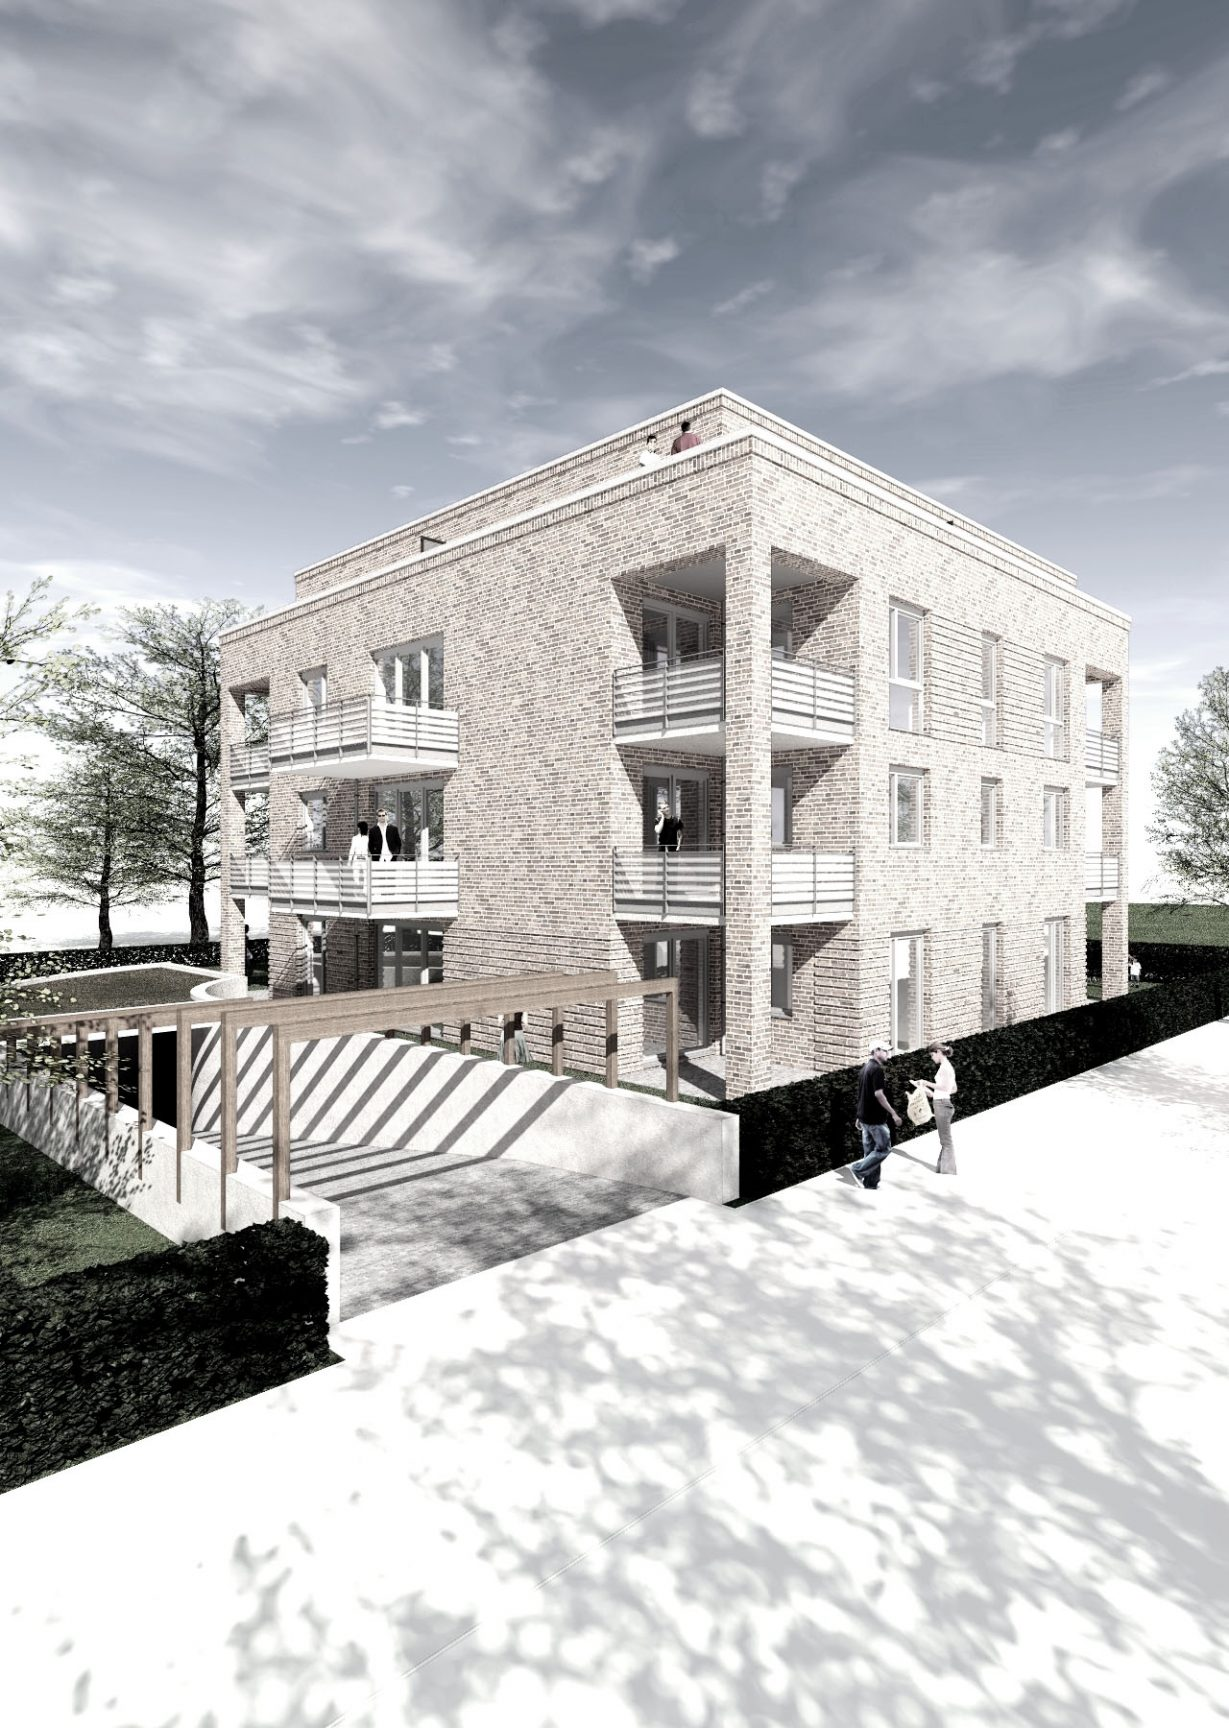 Neubau Wohngebäude Baustart erfolgt Hamburg